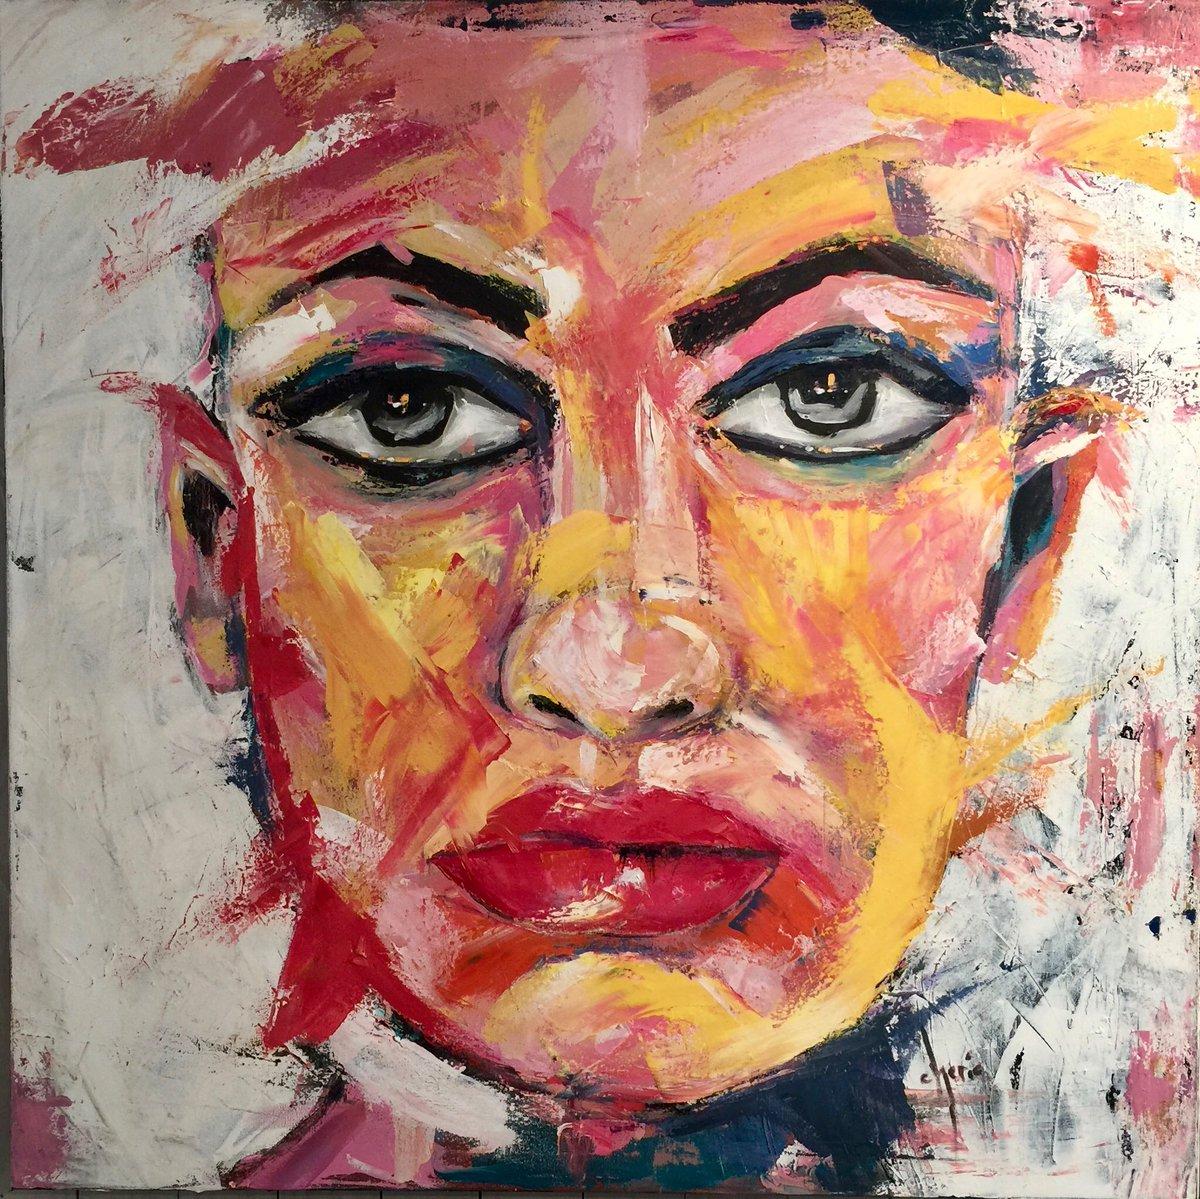 cherie fruehan on twitter define smudge 40 x 40 acrylic on canvas